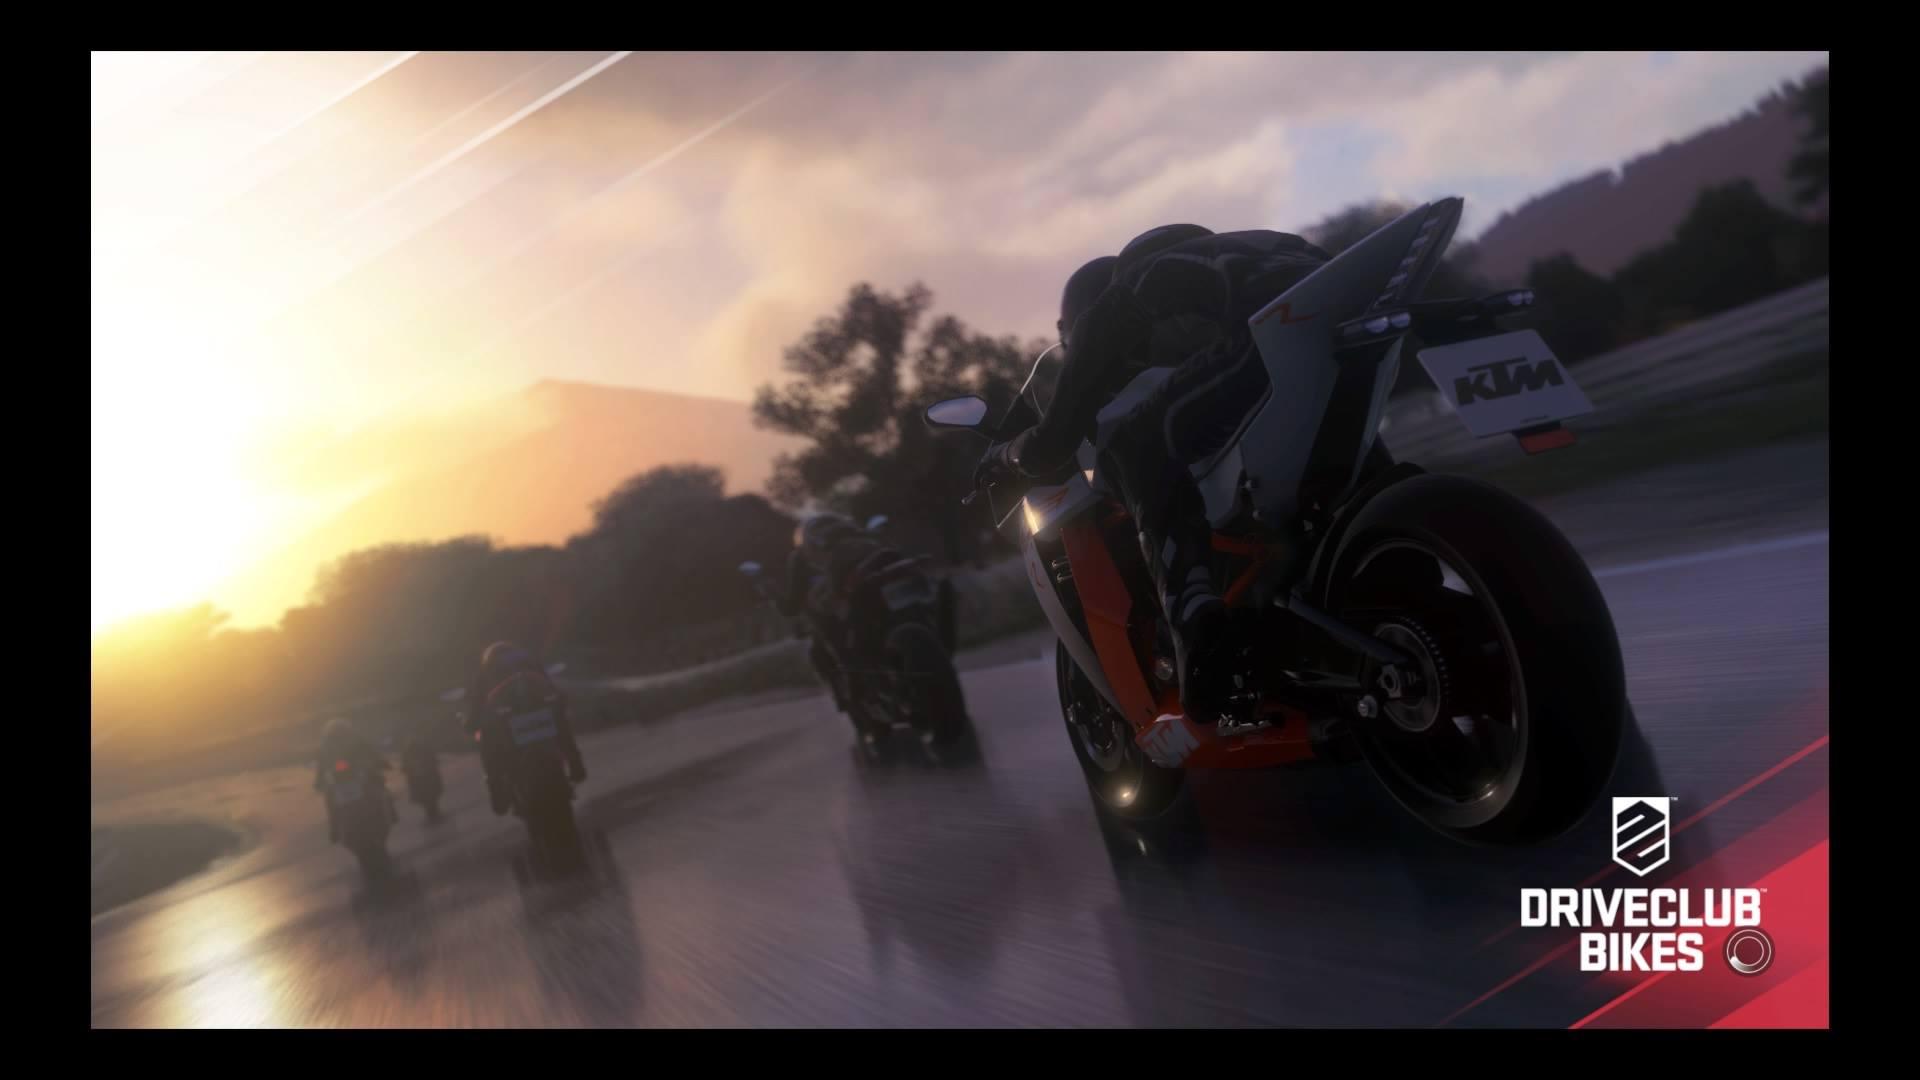 driveclub-bikes-1